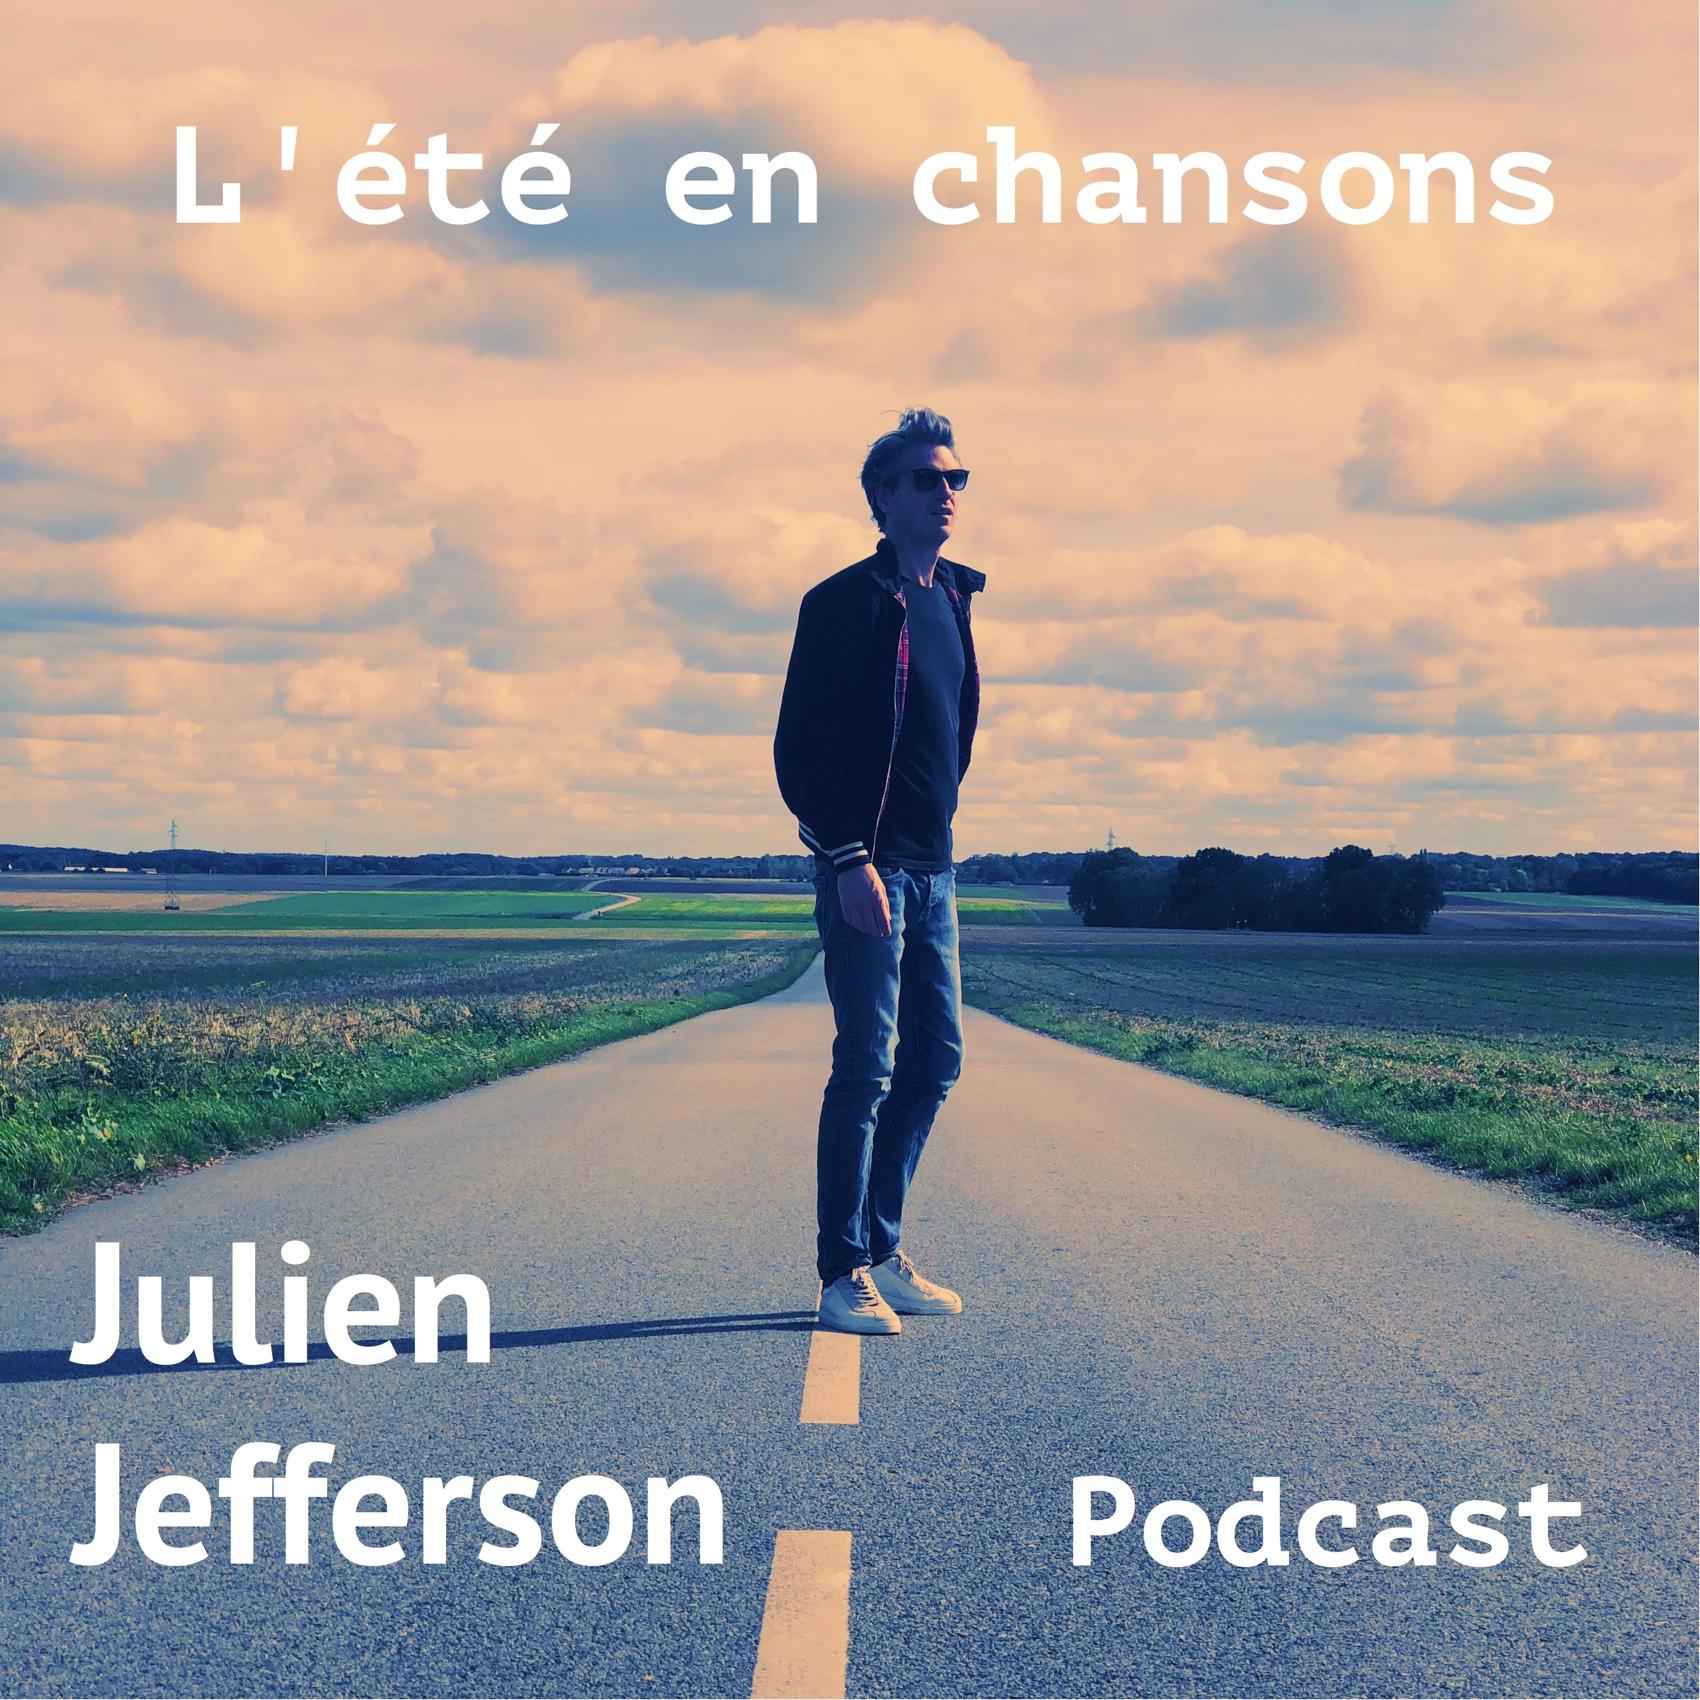 Julien jefferson Podcast